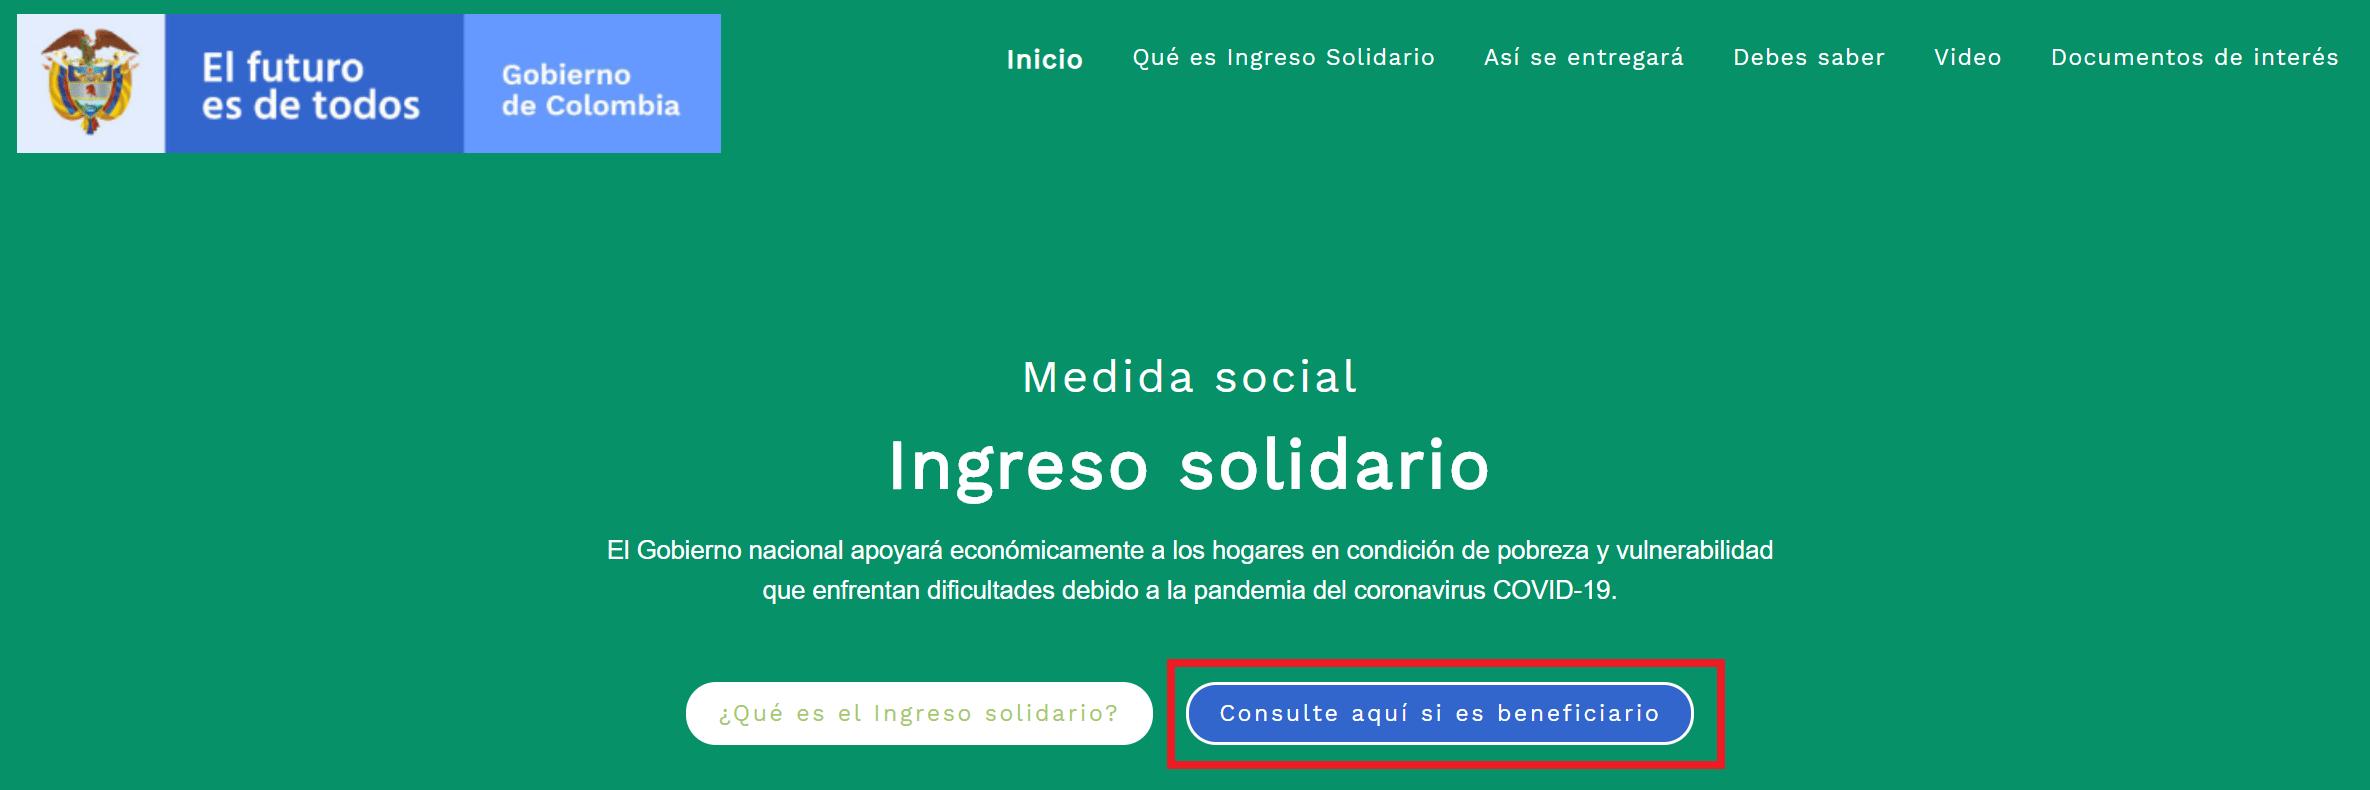 ingreso solidario consulta